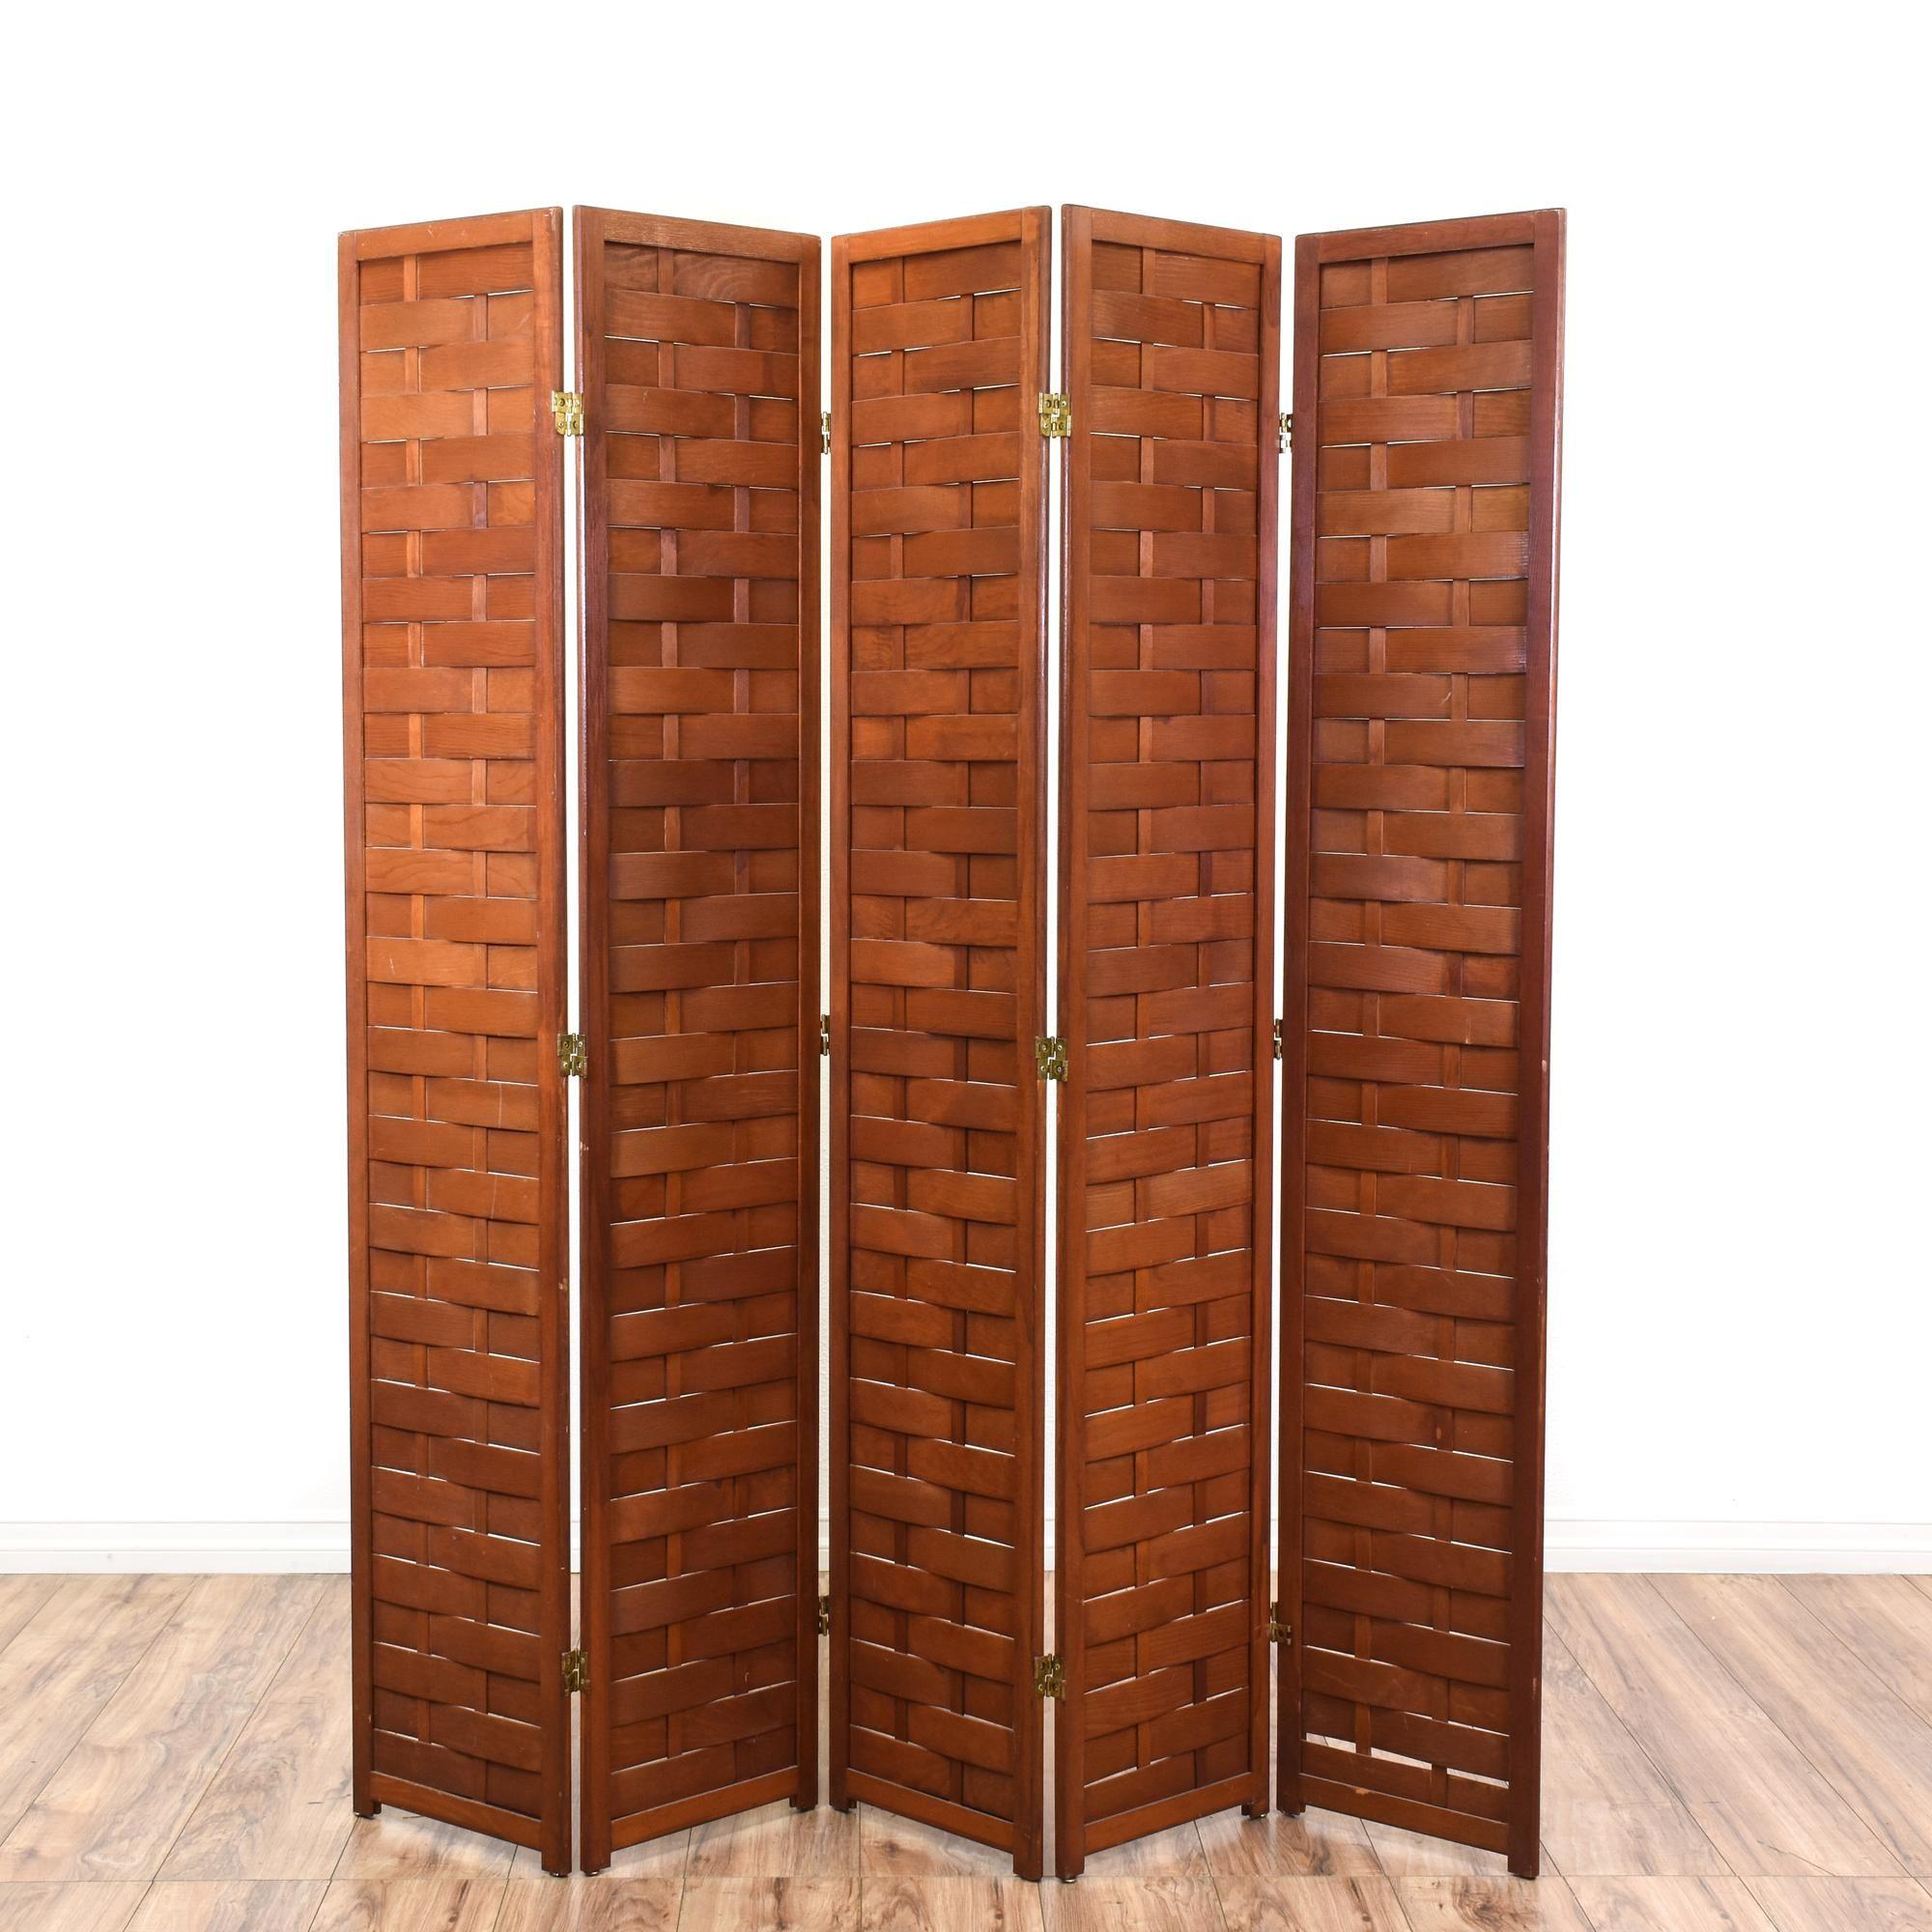 5 Panel Carved Wood Room Divider Screen